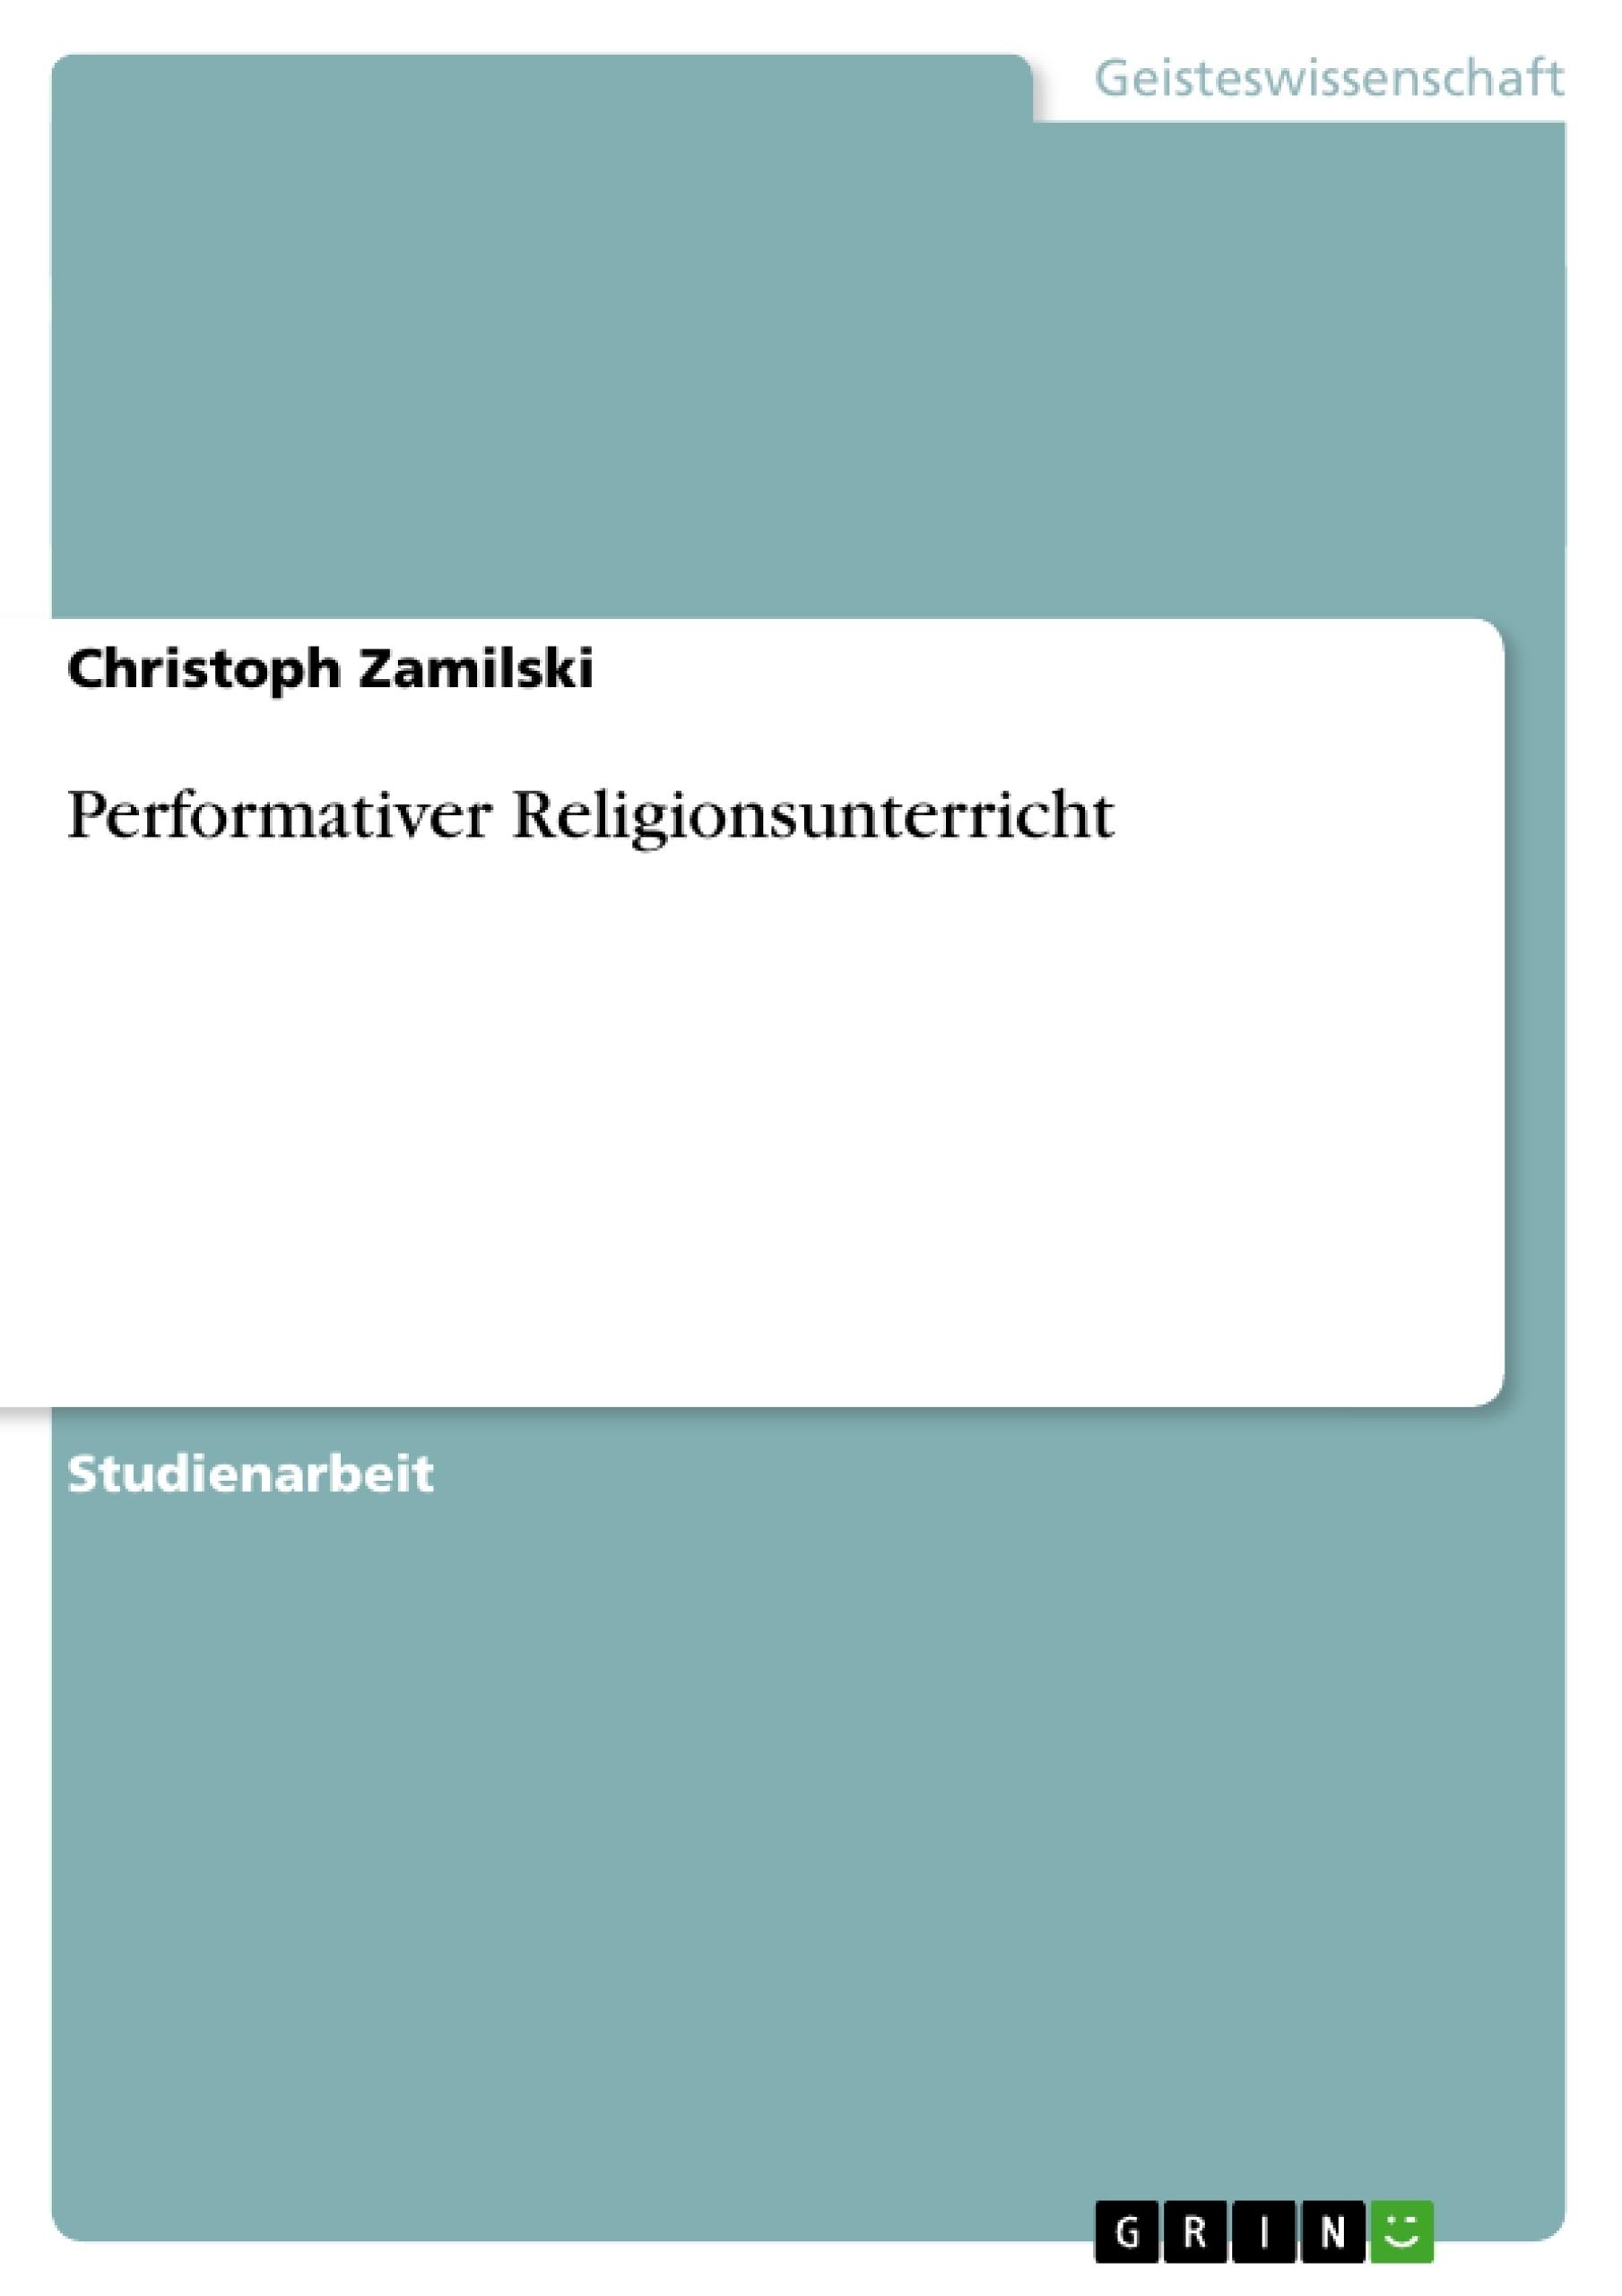 Titel: Performativer Religionsunterricht